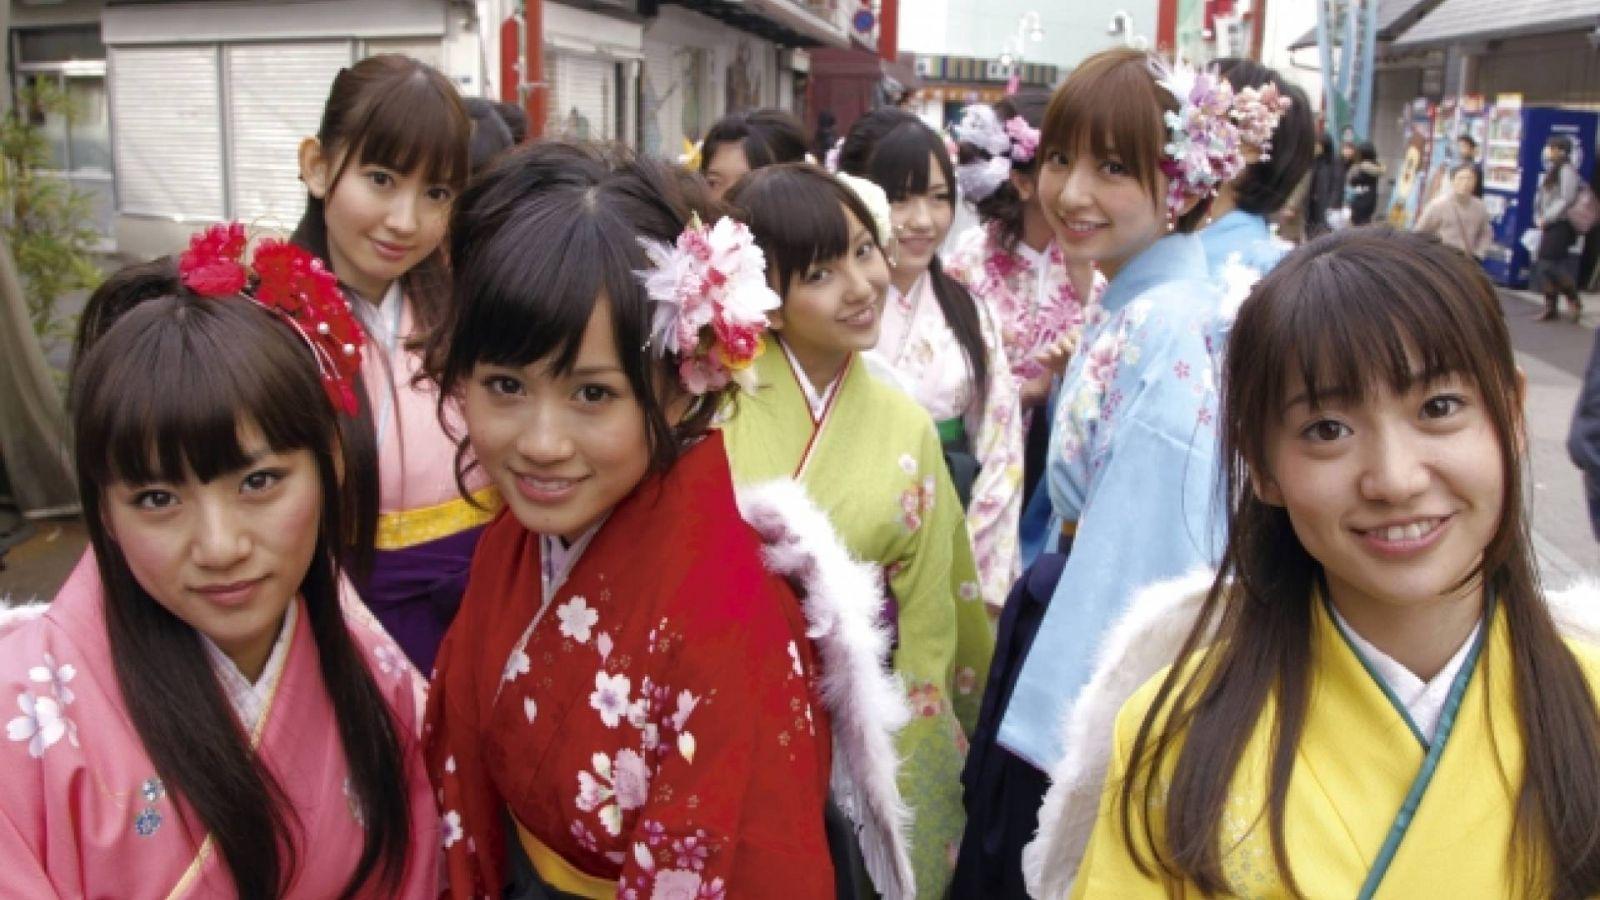 Quarto álbum do AKB48 © AKB48